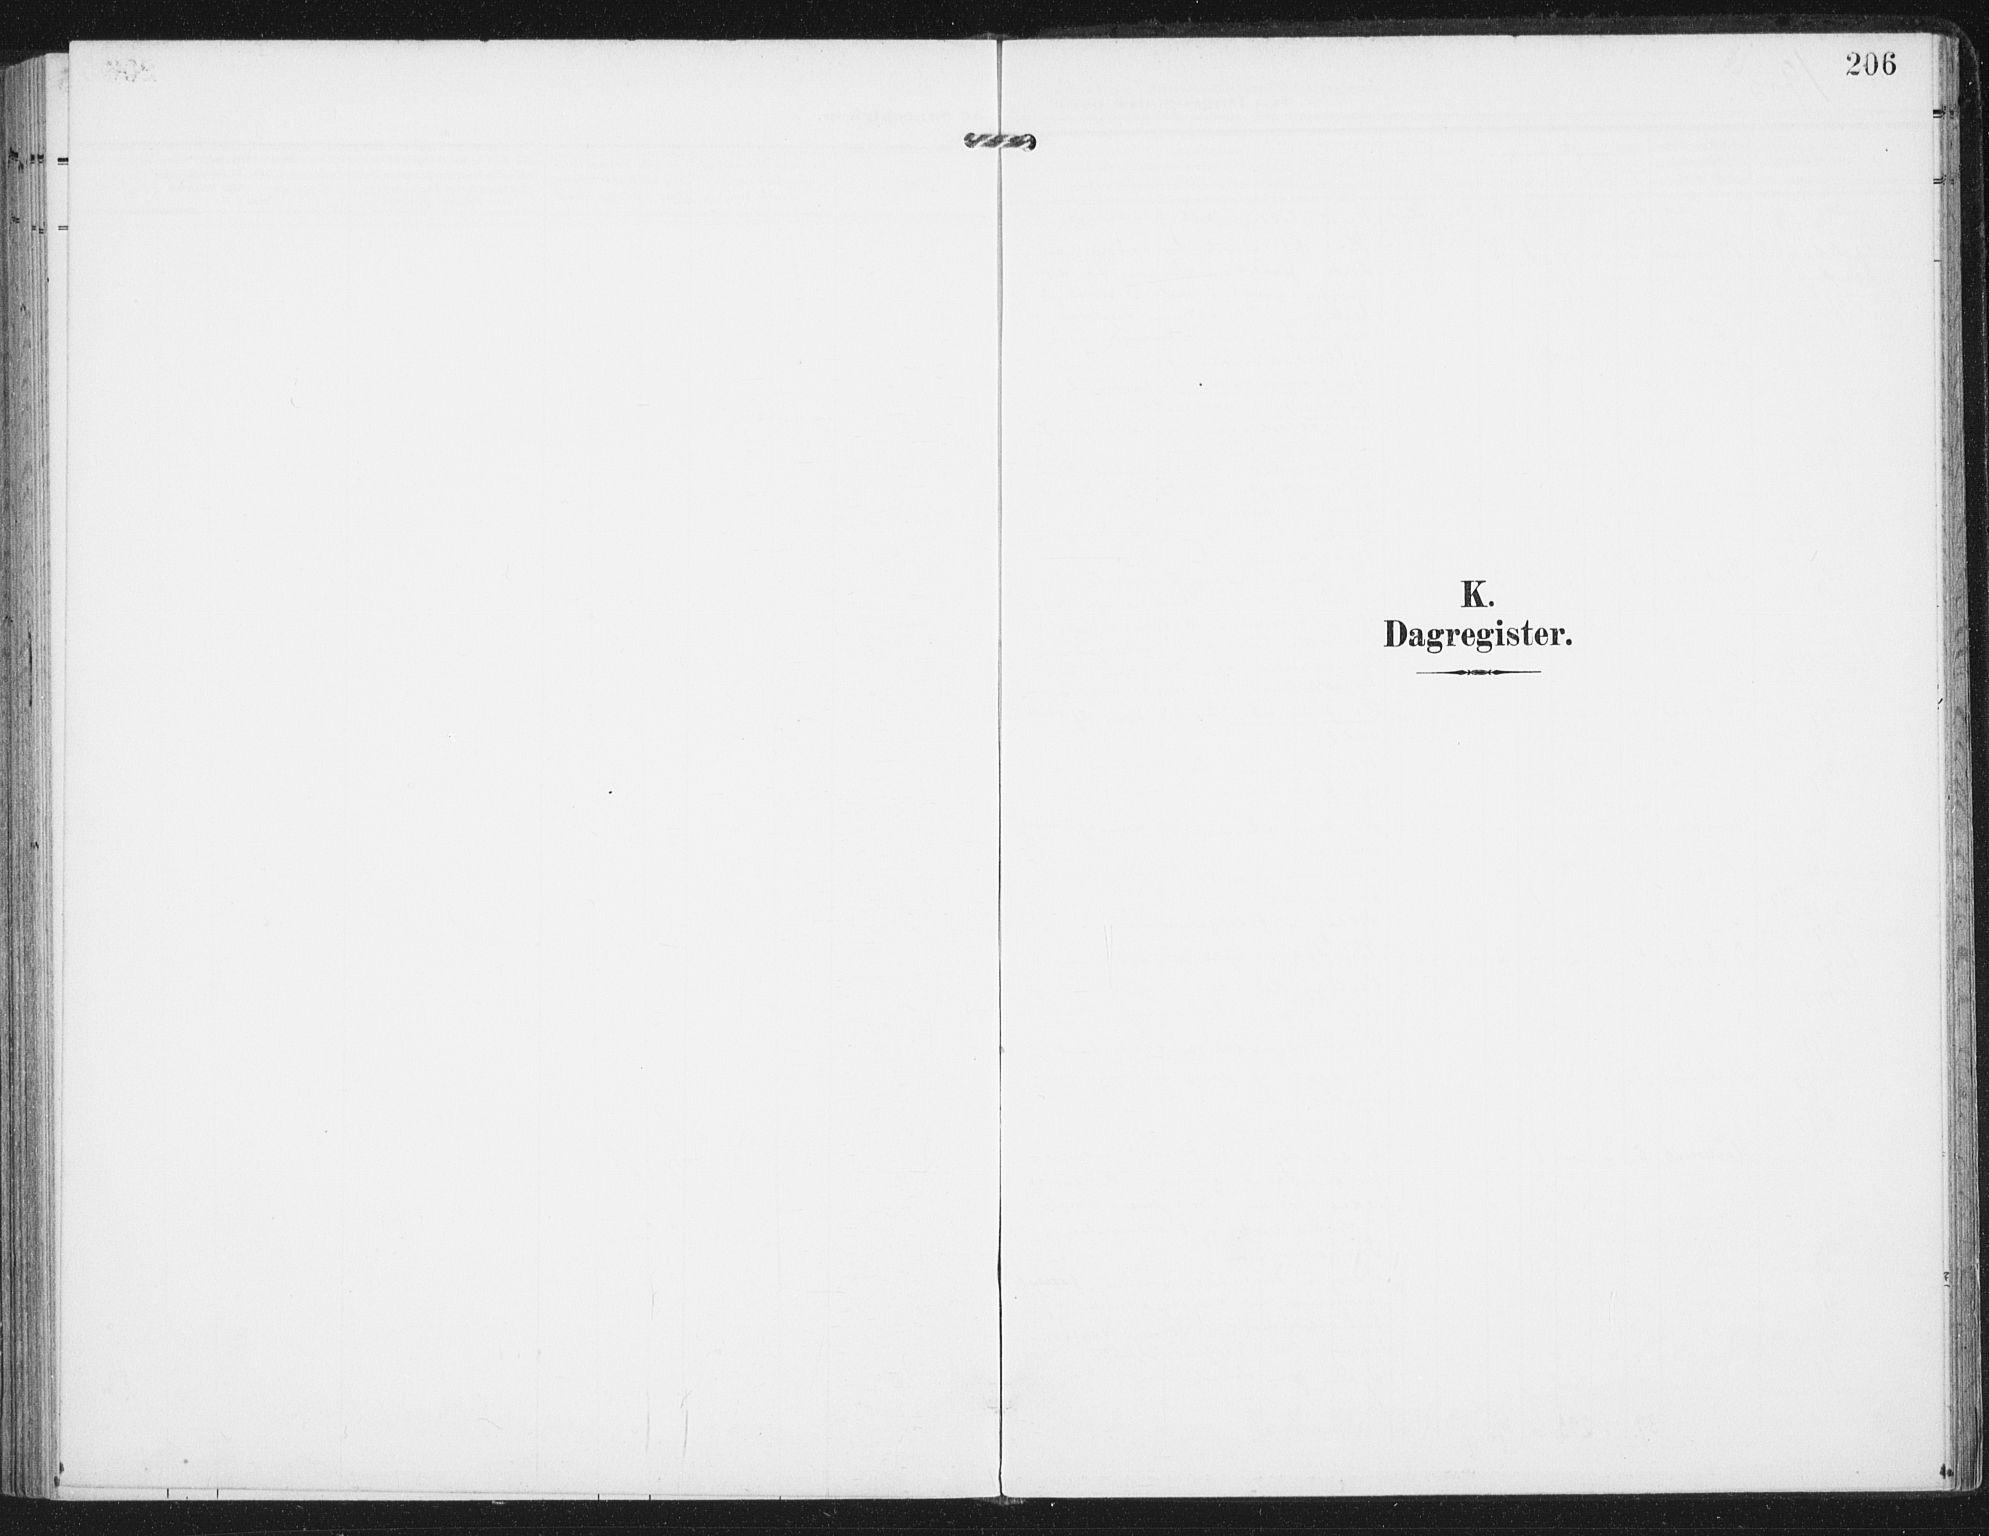 SAT, Ministerialprotokoller, klokkerbøker og fødselsregistre - Nordland, 885/L1206: Ministerialbok nr. 885A07, 1905-1915, s. 206